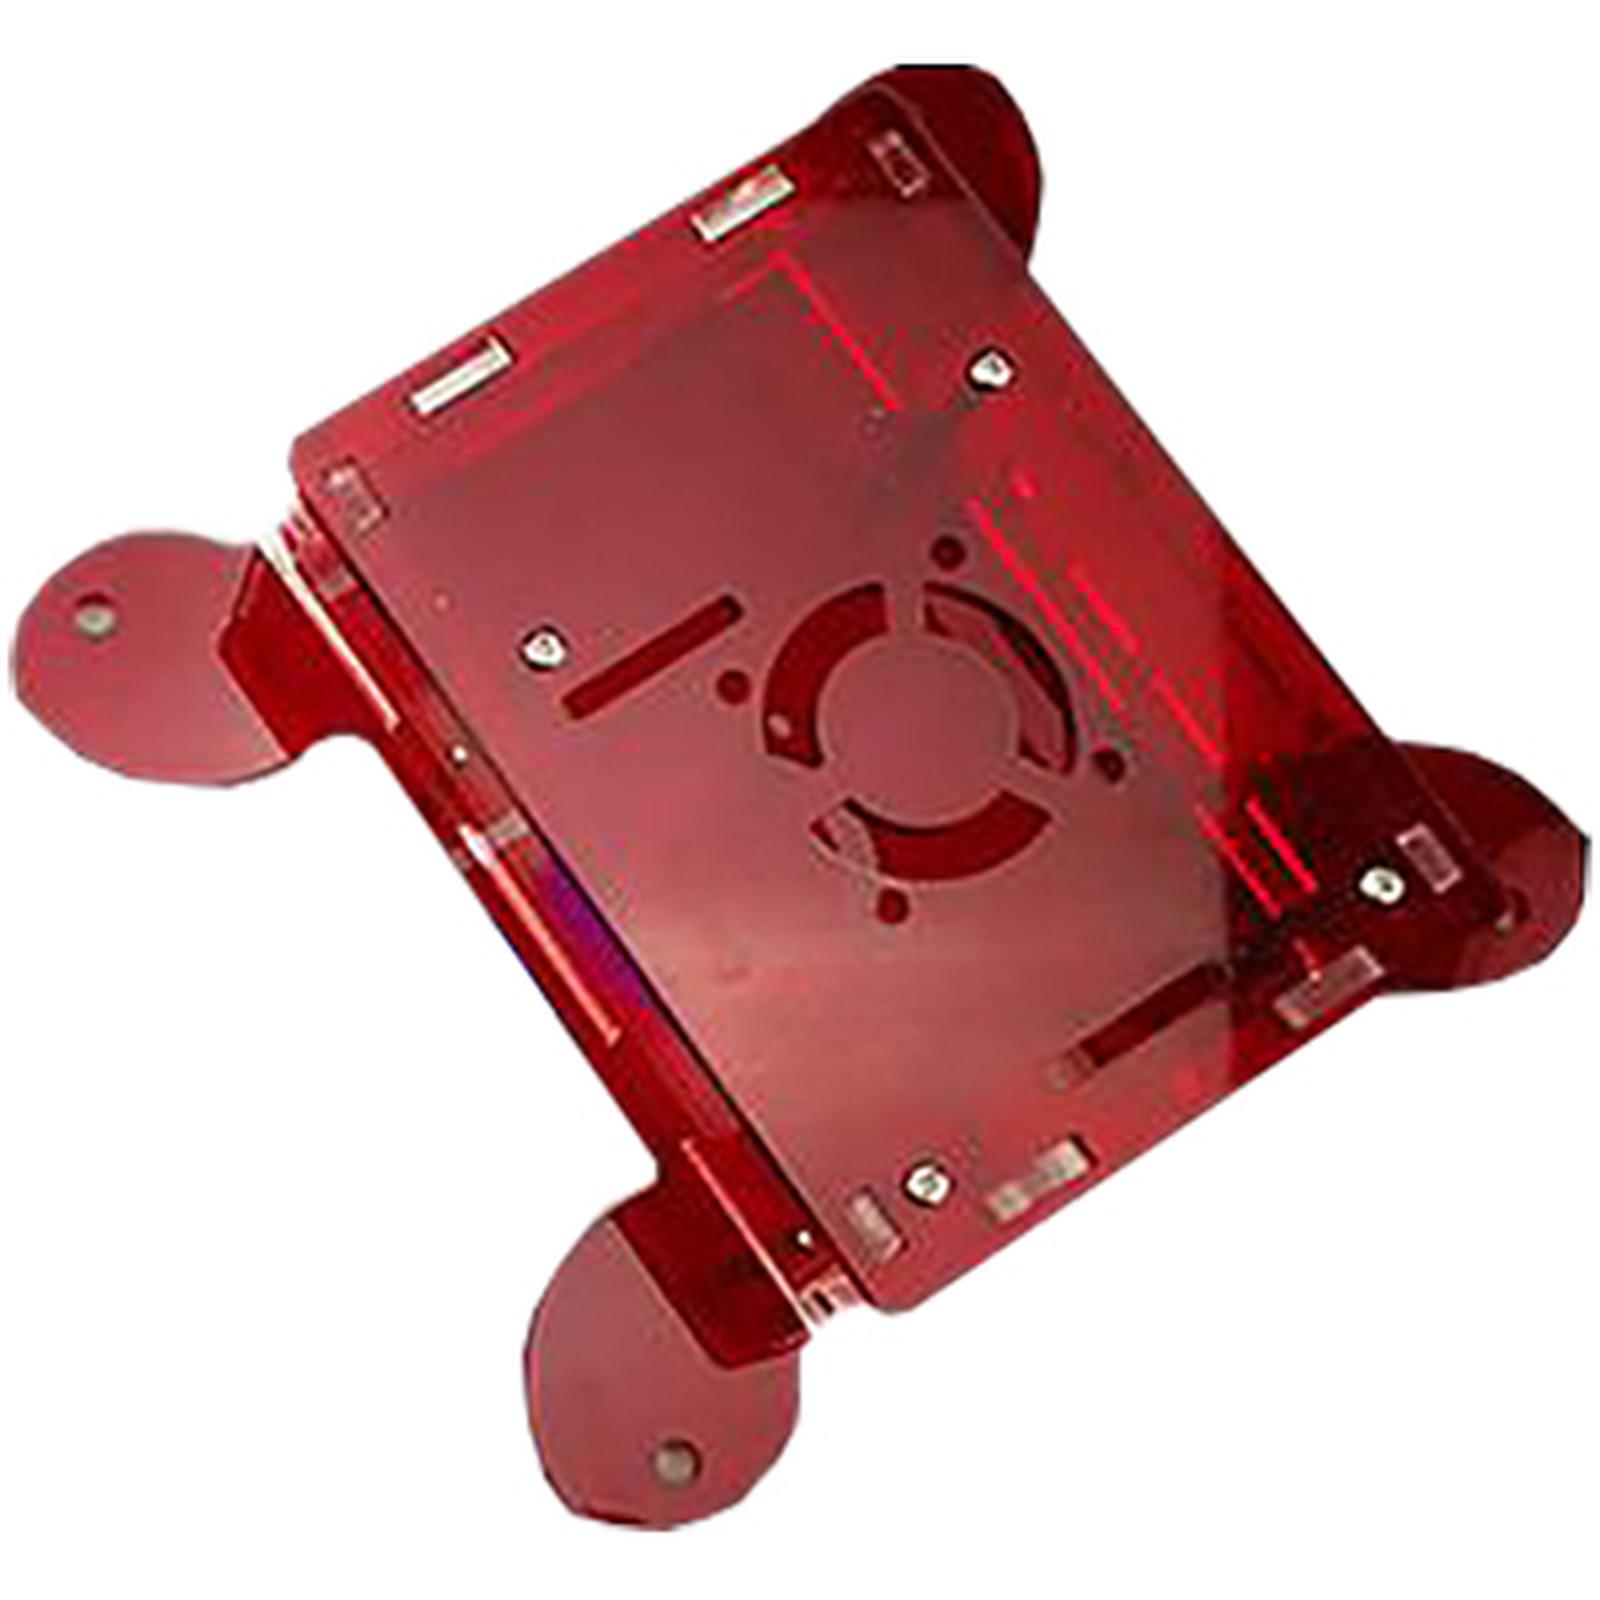 Boitier VESA pour Raspberry Pi 4B (Rouge)